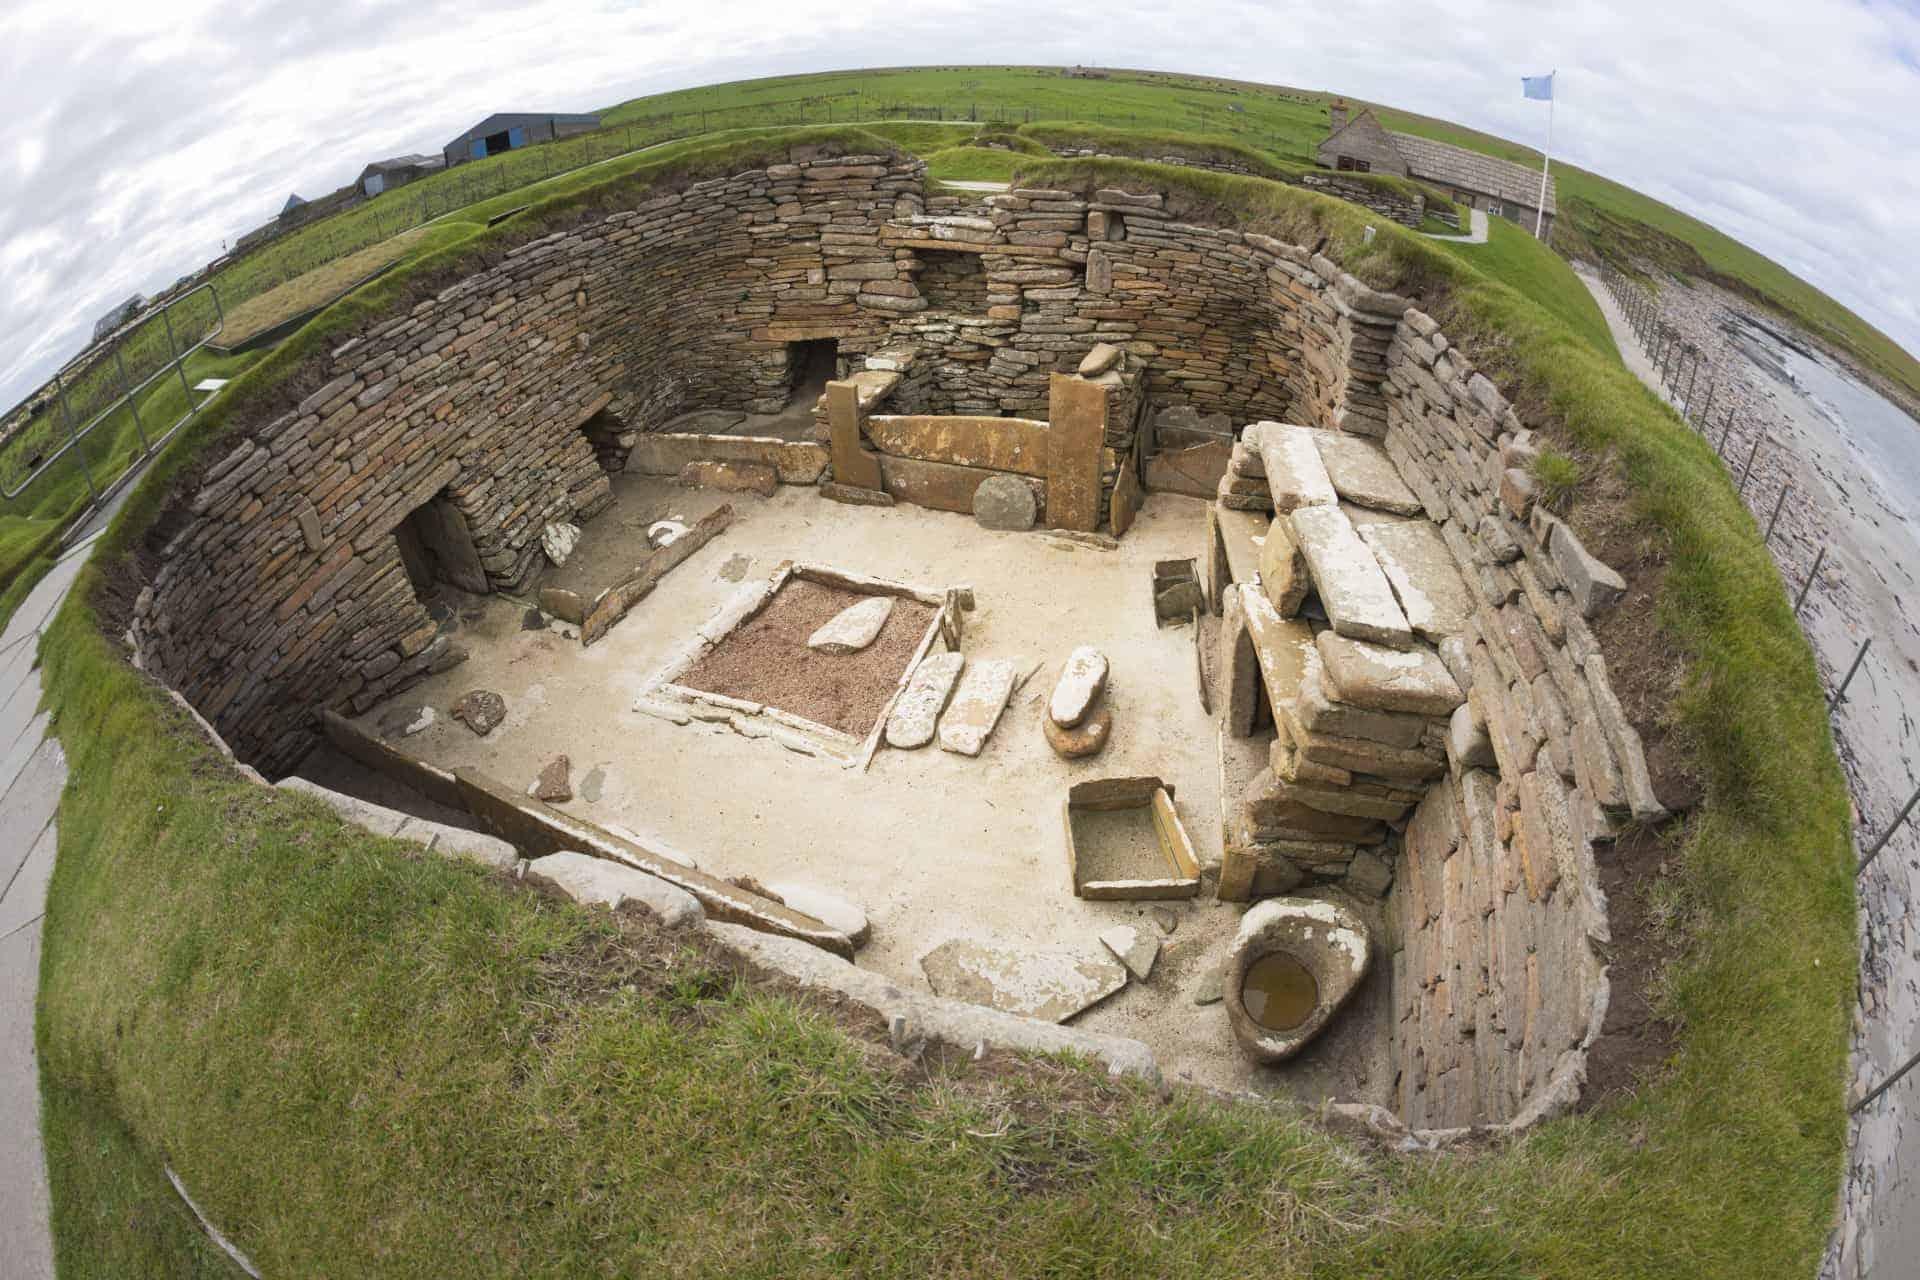 Scotland History: A house at Skara Brae, Orkney